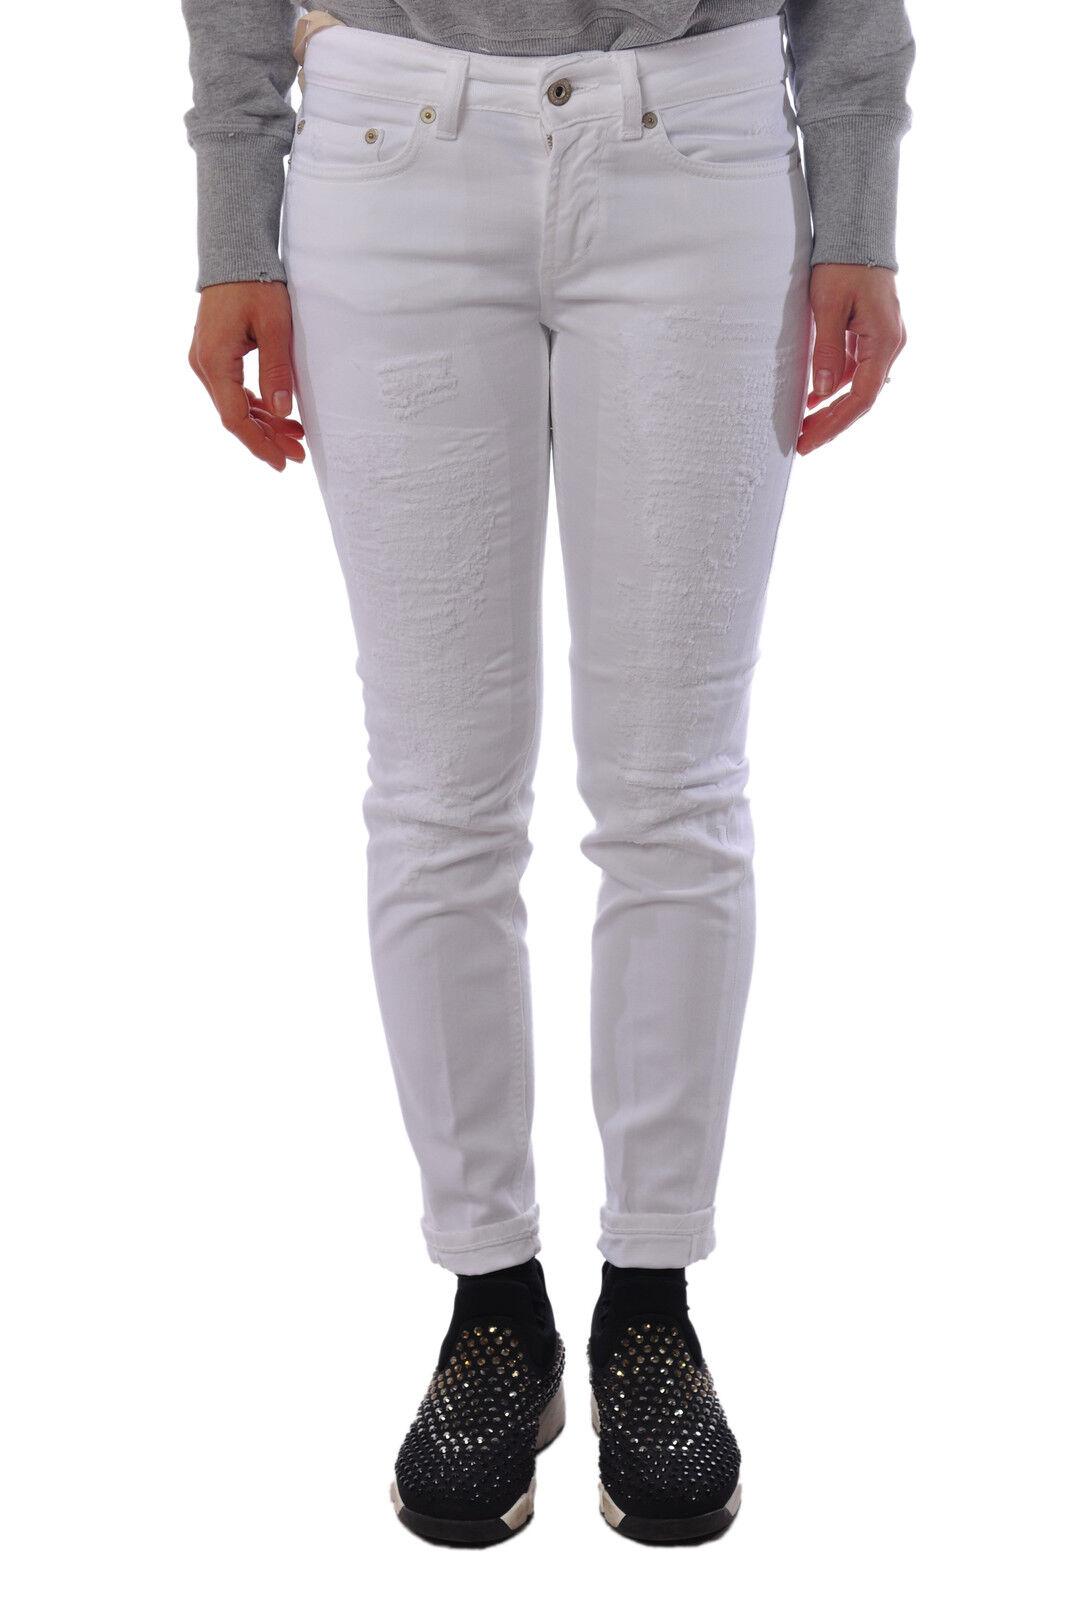 Dondup  -  Pants - Female - 27 - White - 1325804B160728